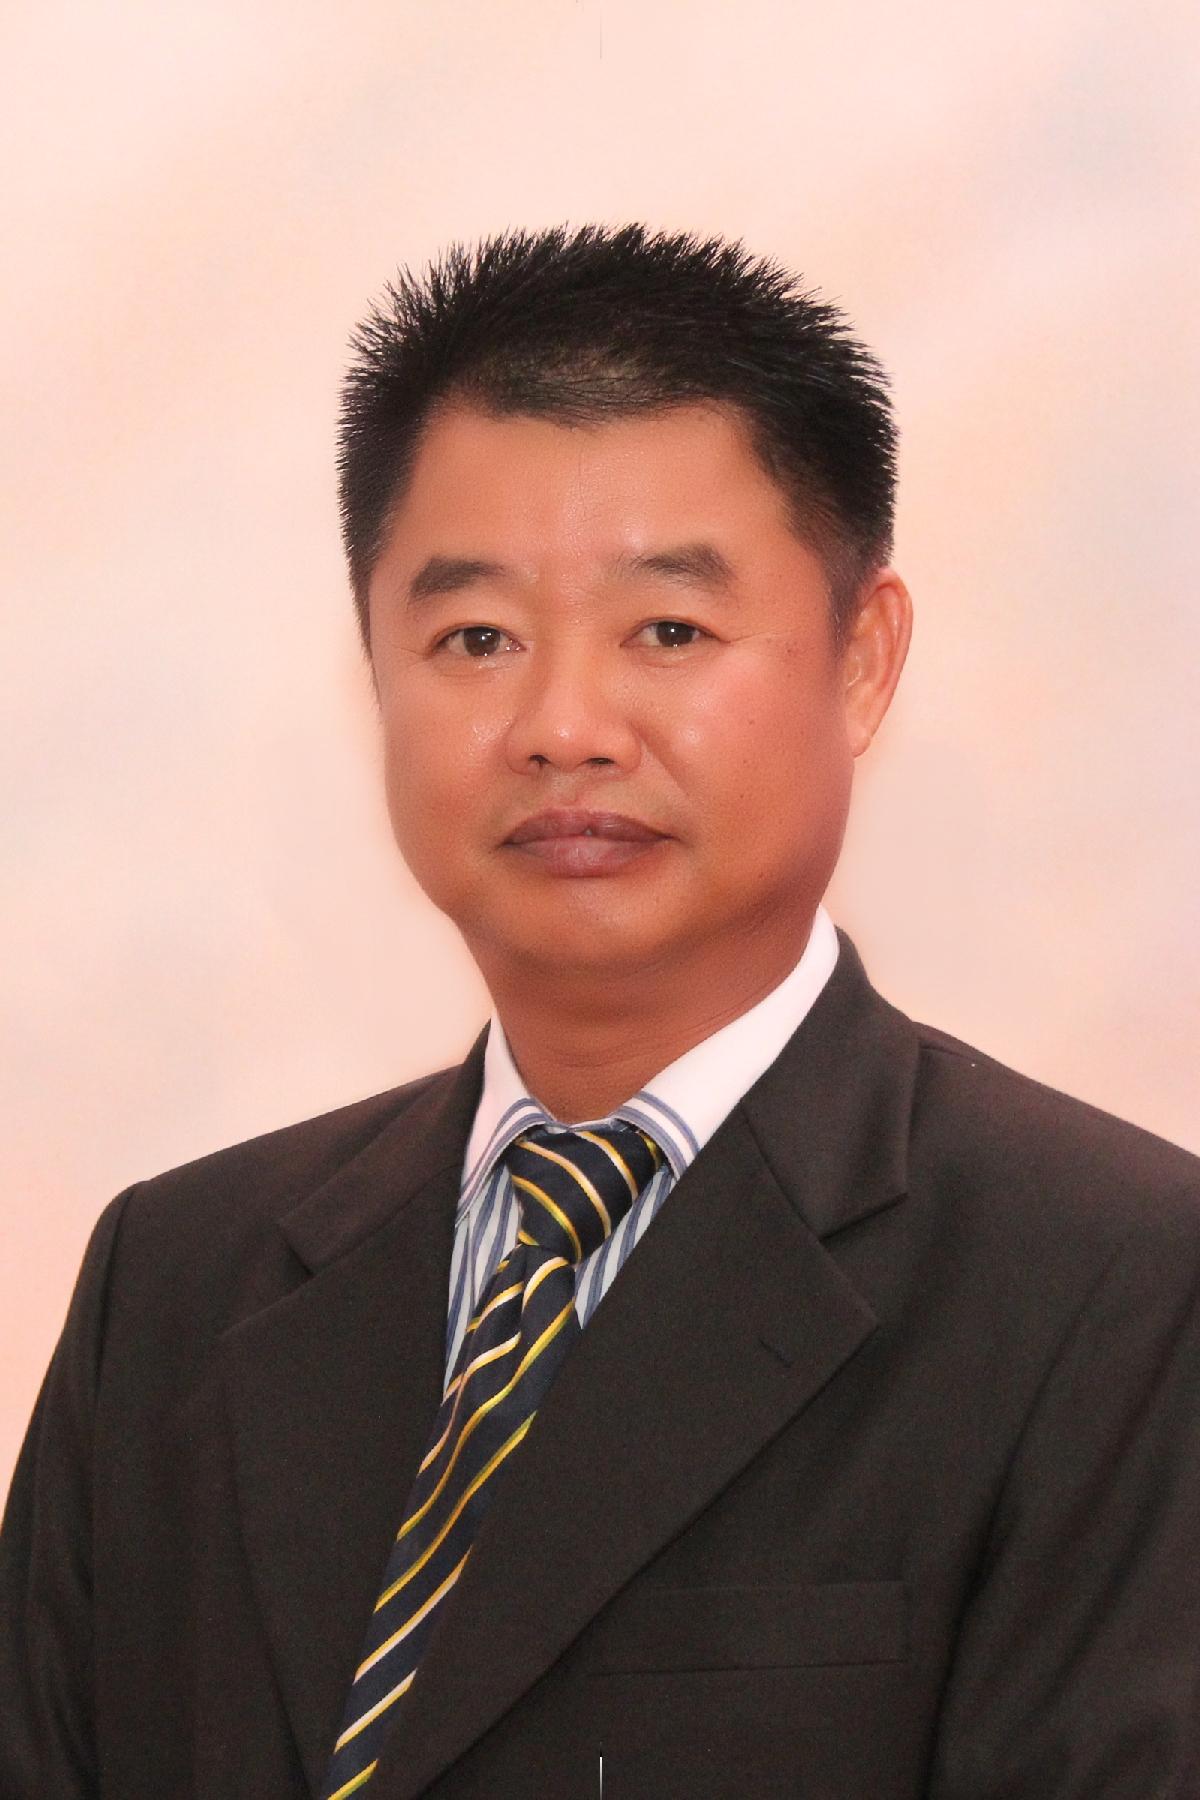 <h80>拿督蔡永祥</h80><br>Dato' Chai Yoon Siong